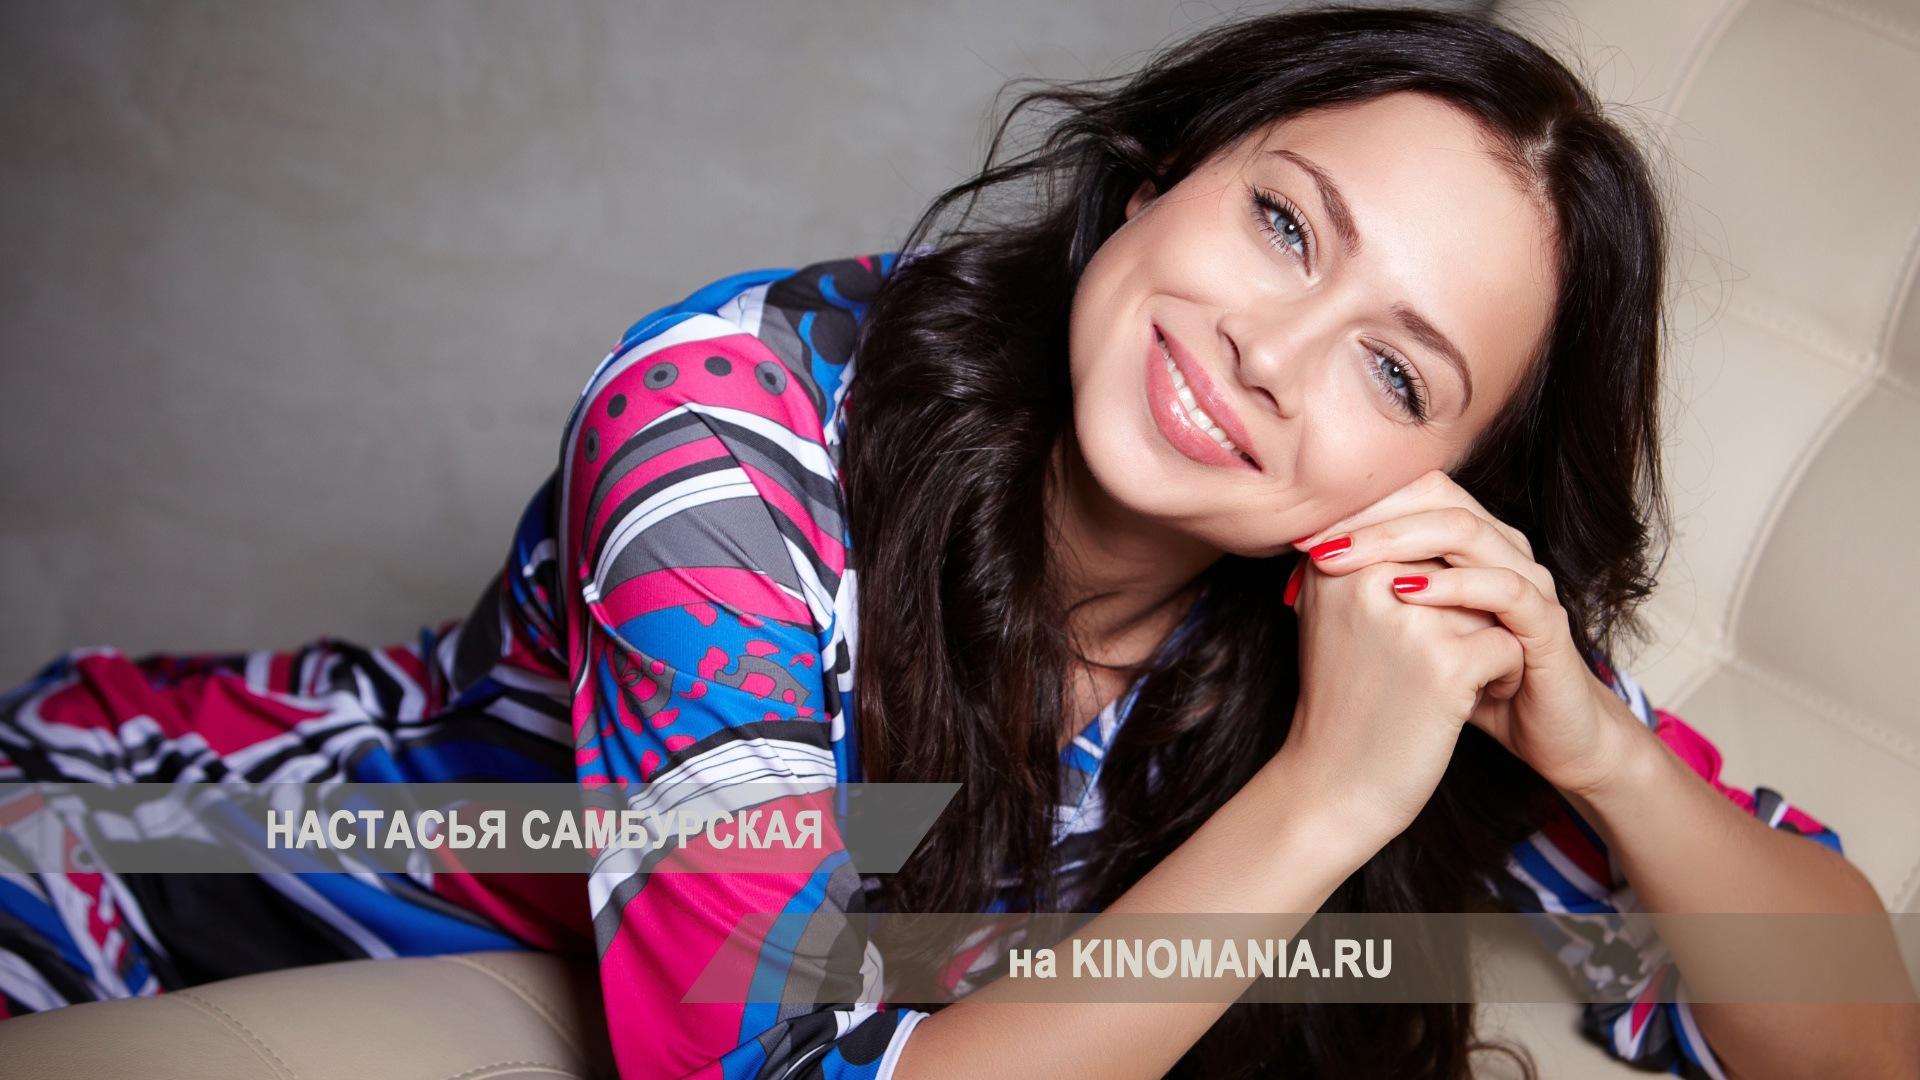 http://www.zastavki.com/pictures/originals/2014/Girls_Known_star_Nastasya_Samburskaya_074593_.jpg